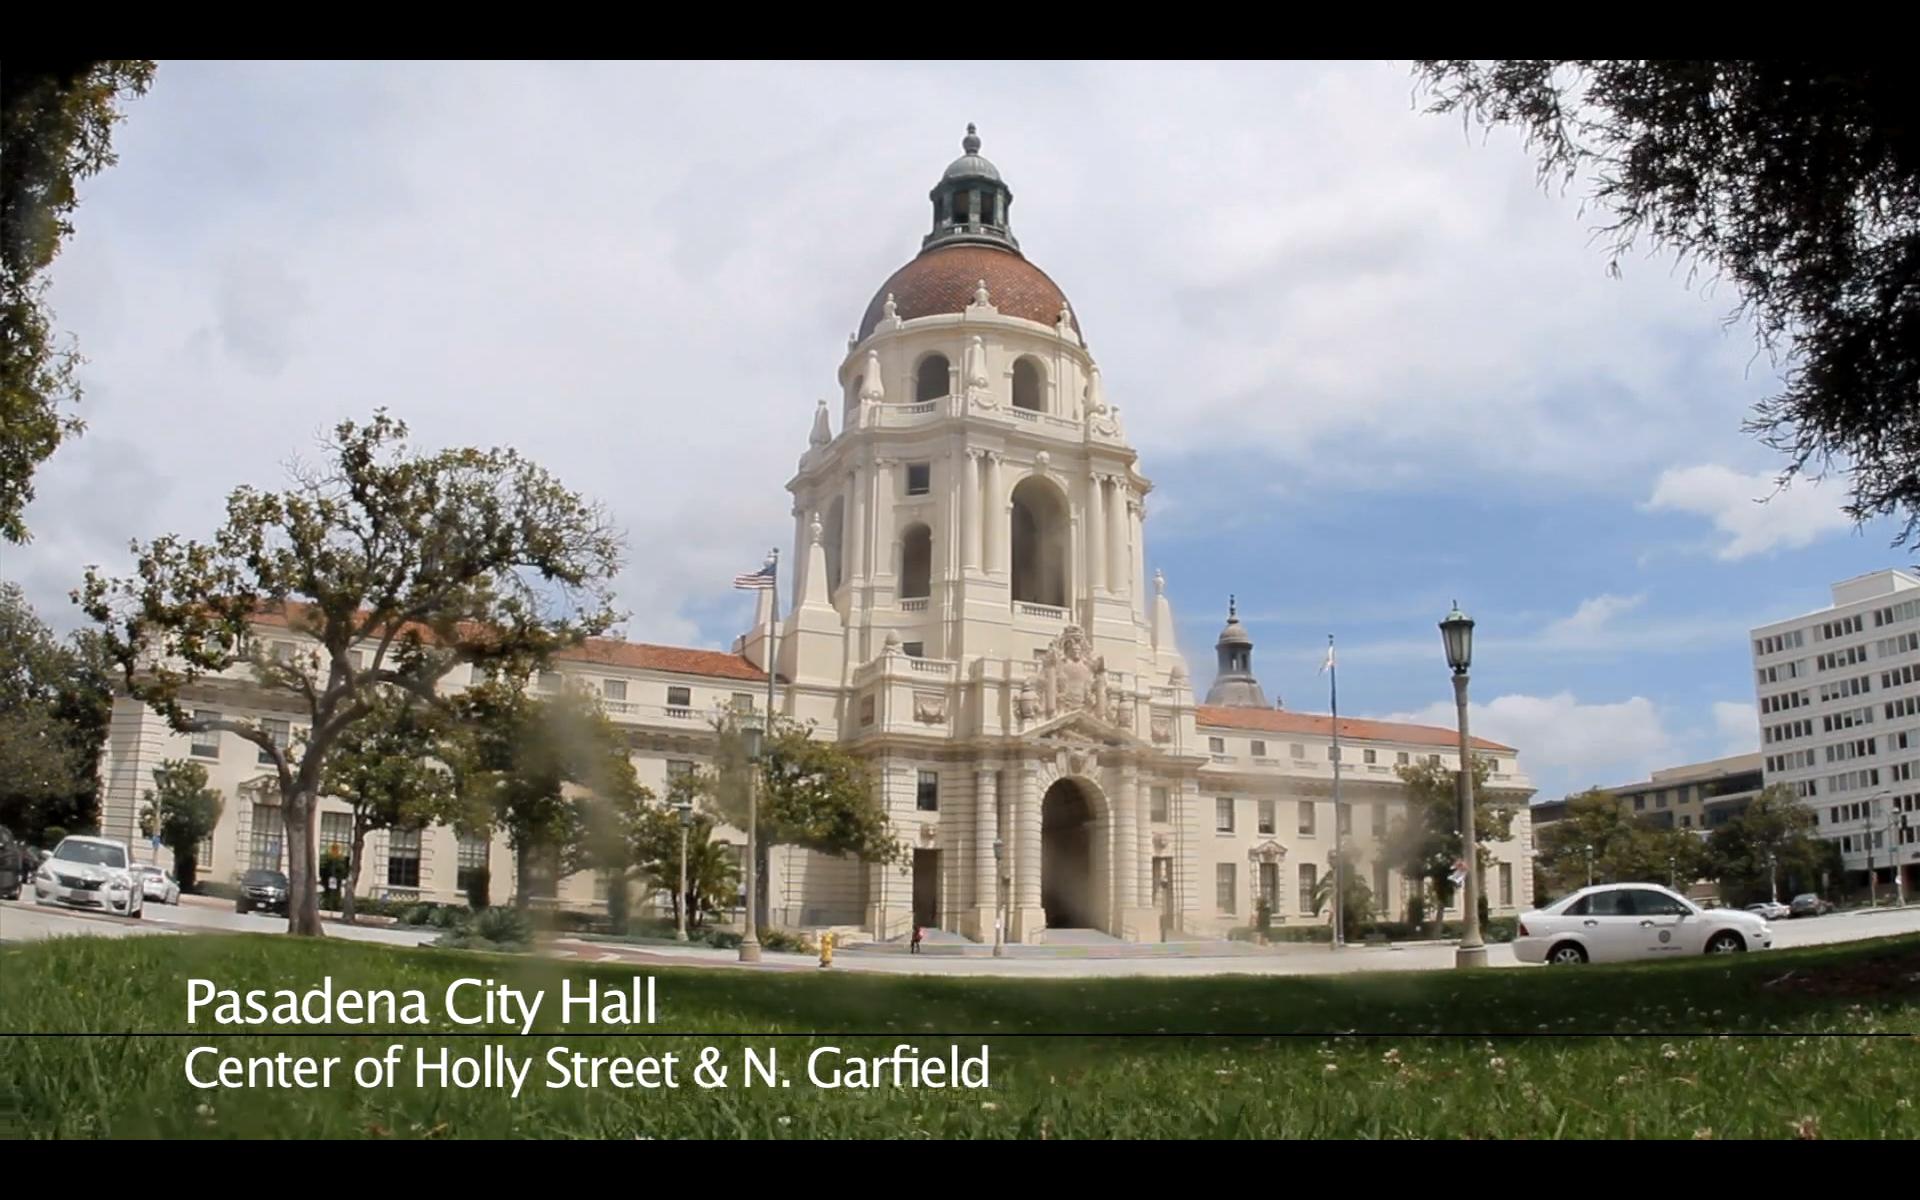 Pasadena Civic Center and City Hall